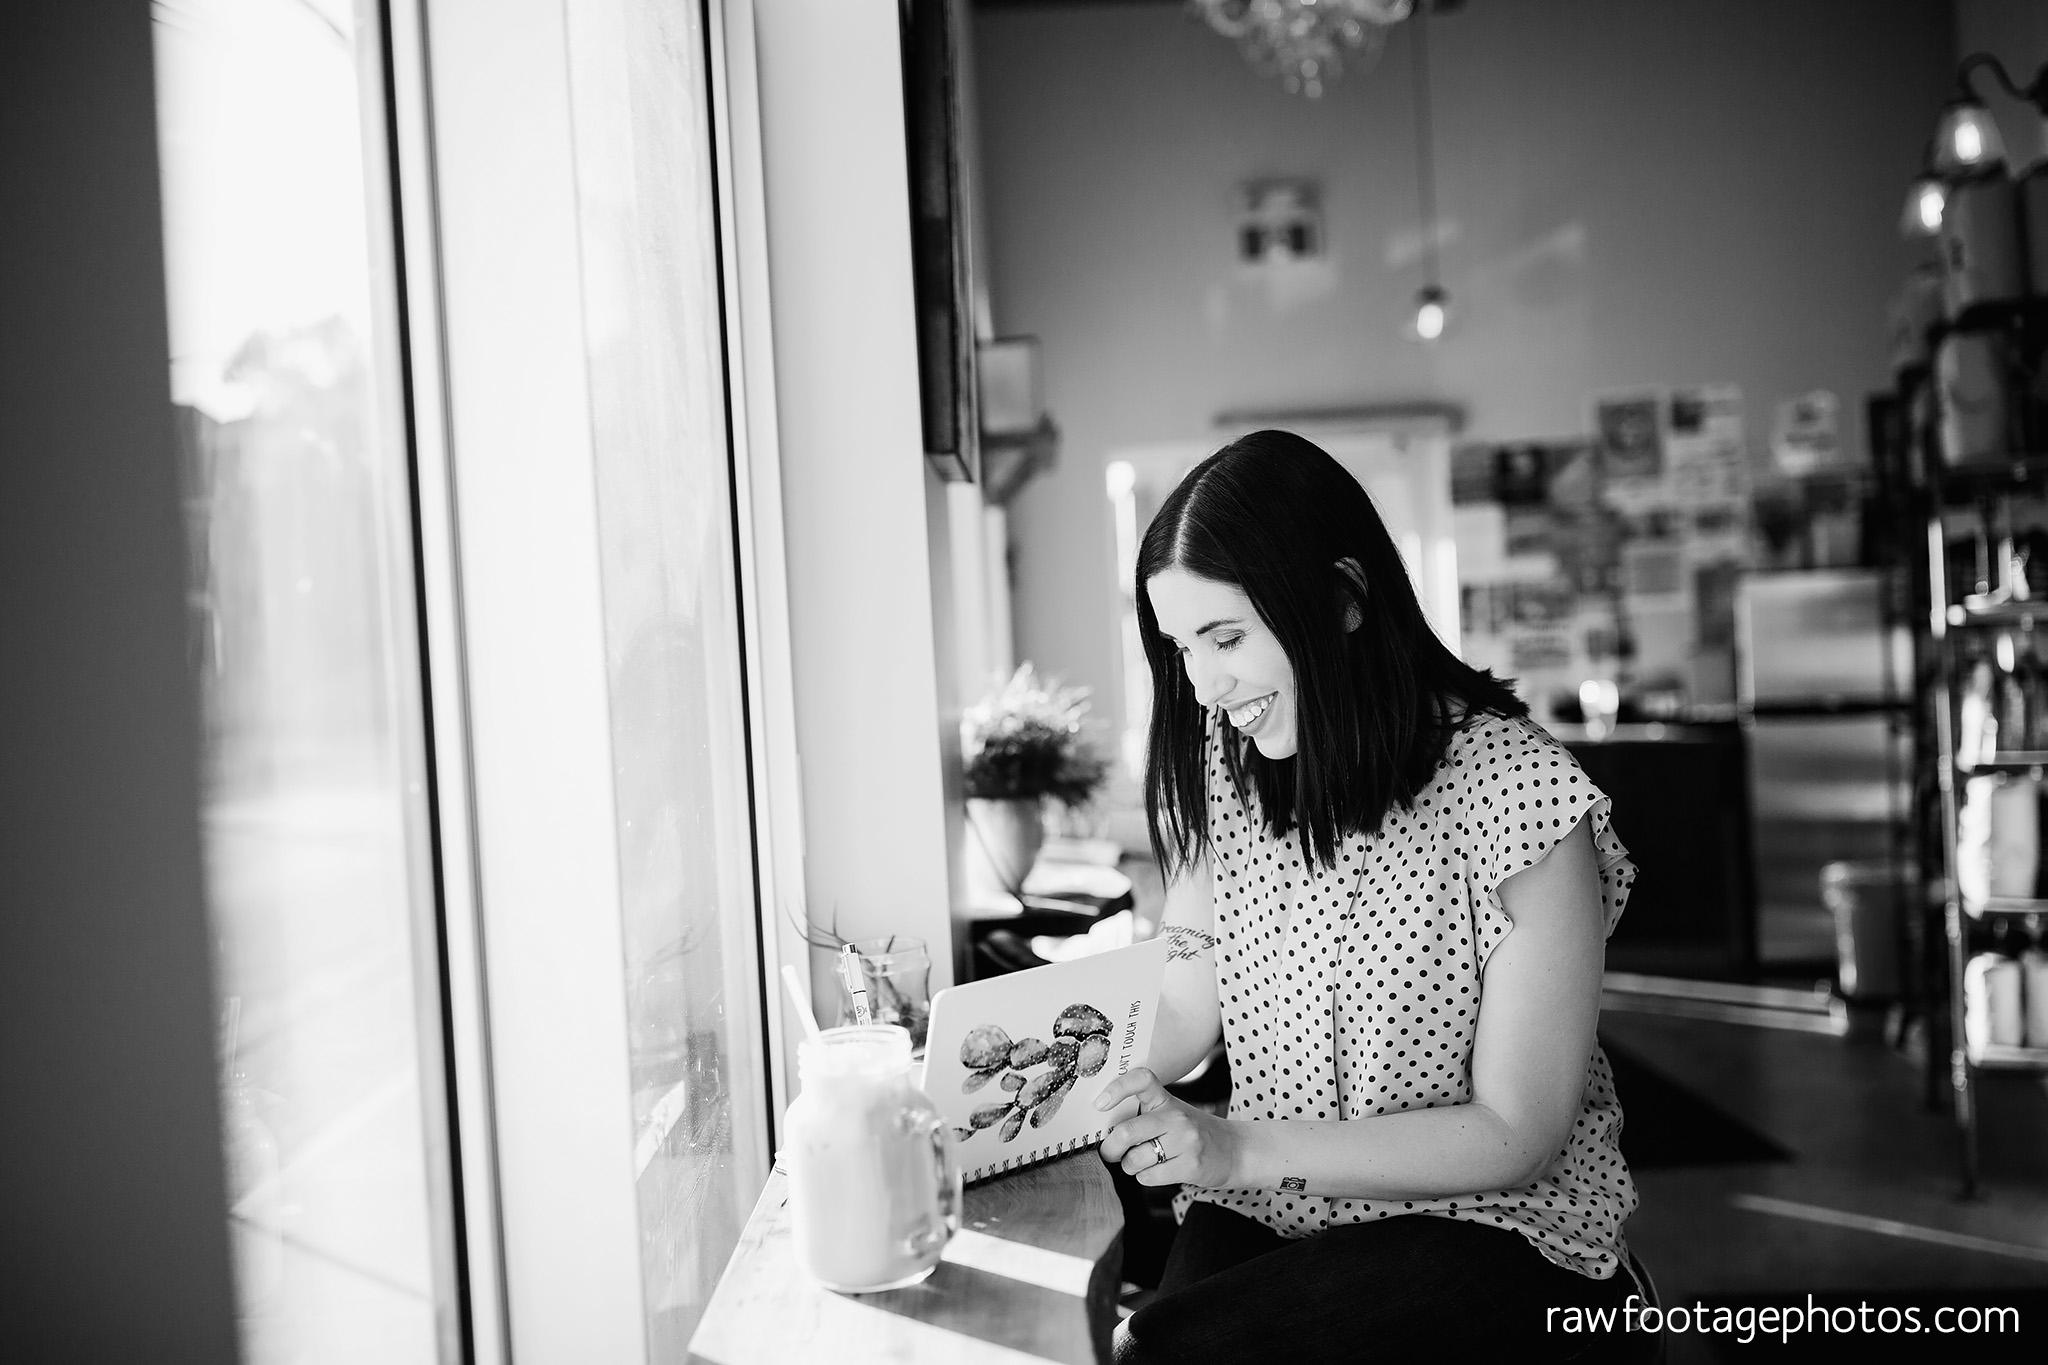 london_ontario_branding_photographer-lifestyle_headshot_session-golden_hour-cafe-photographer_branding-raw_footage_photography-corgi-dog006.jpg